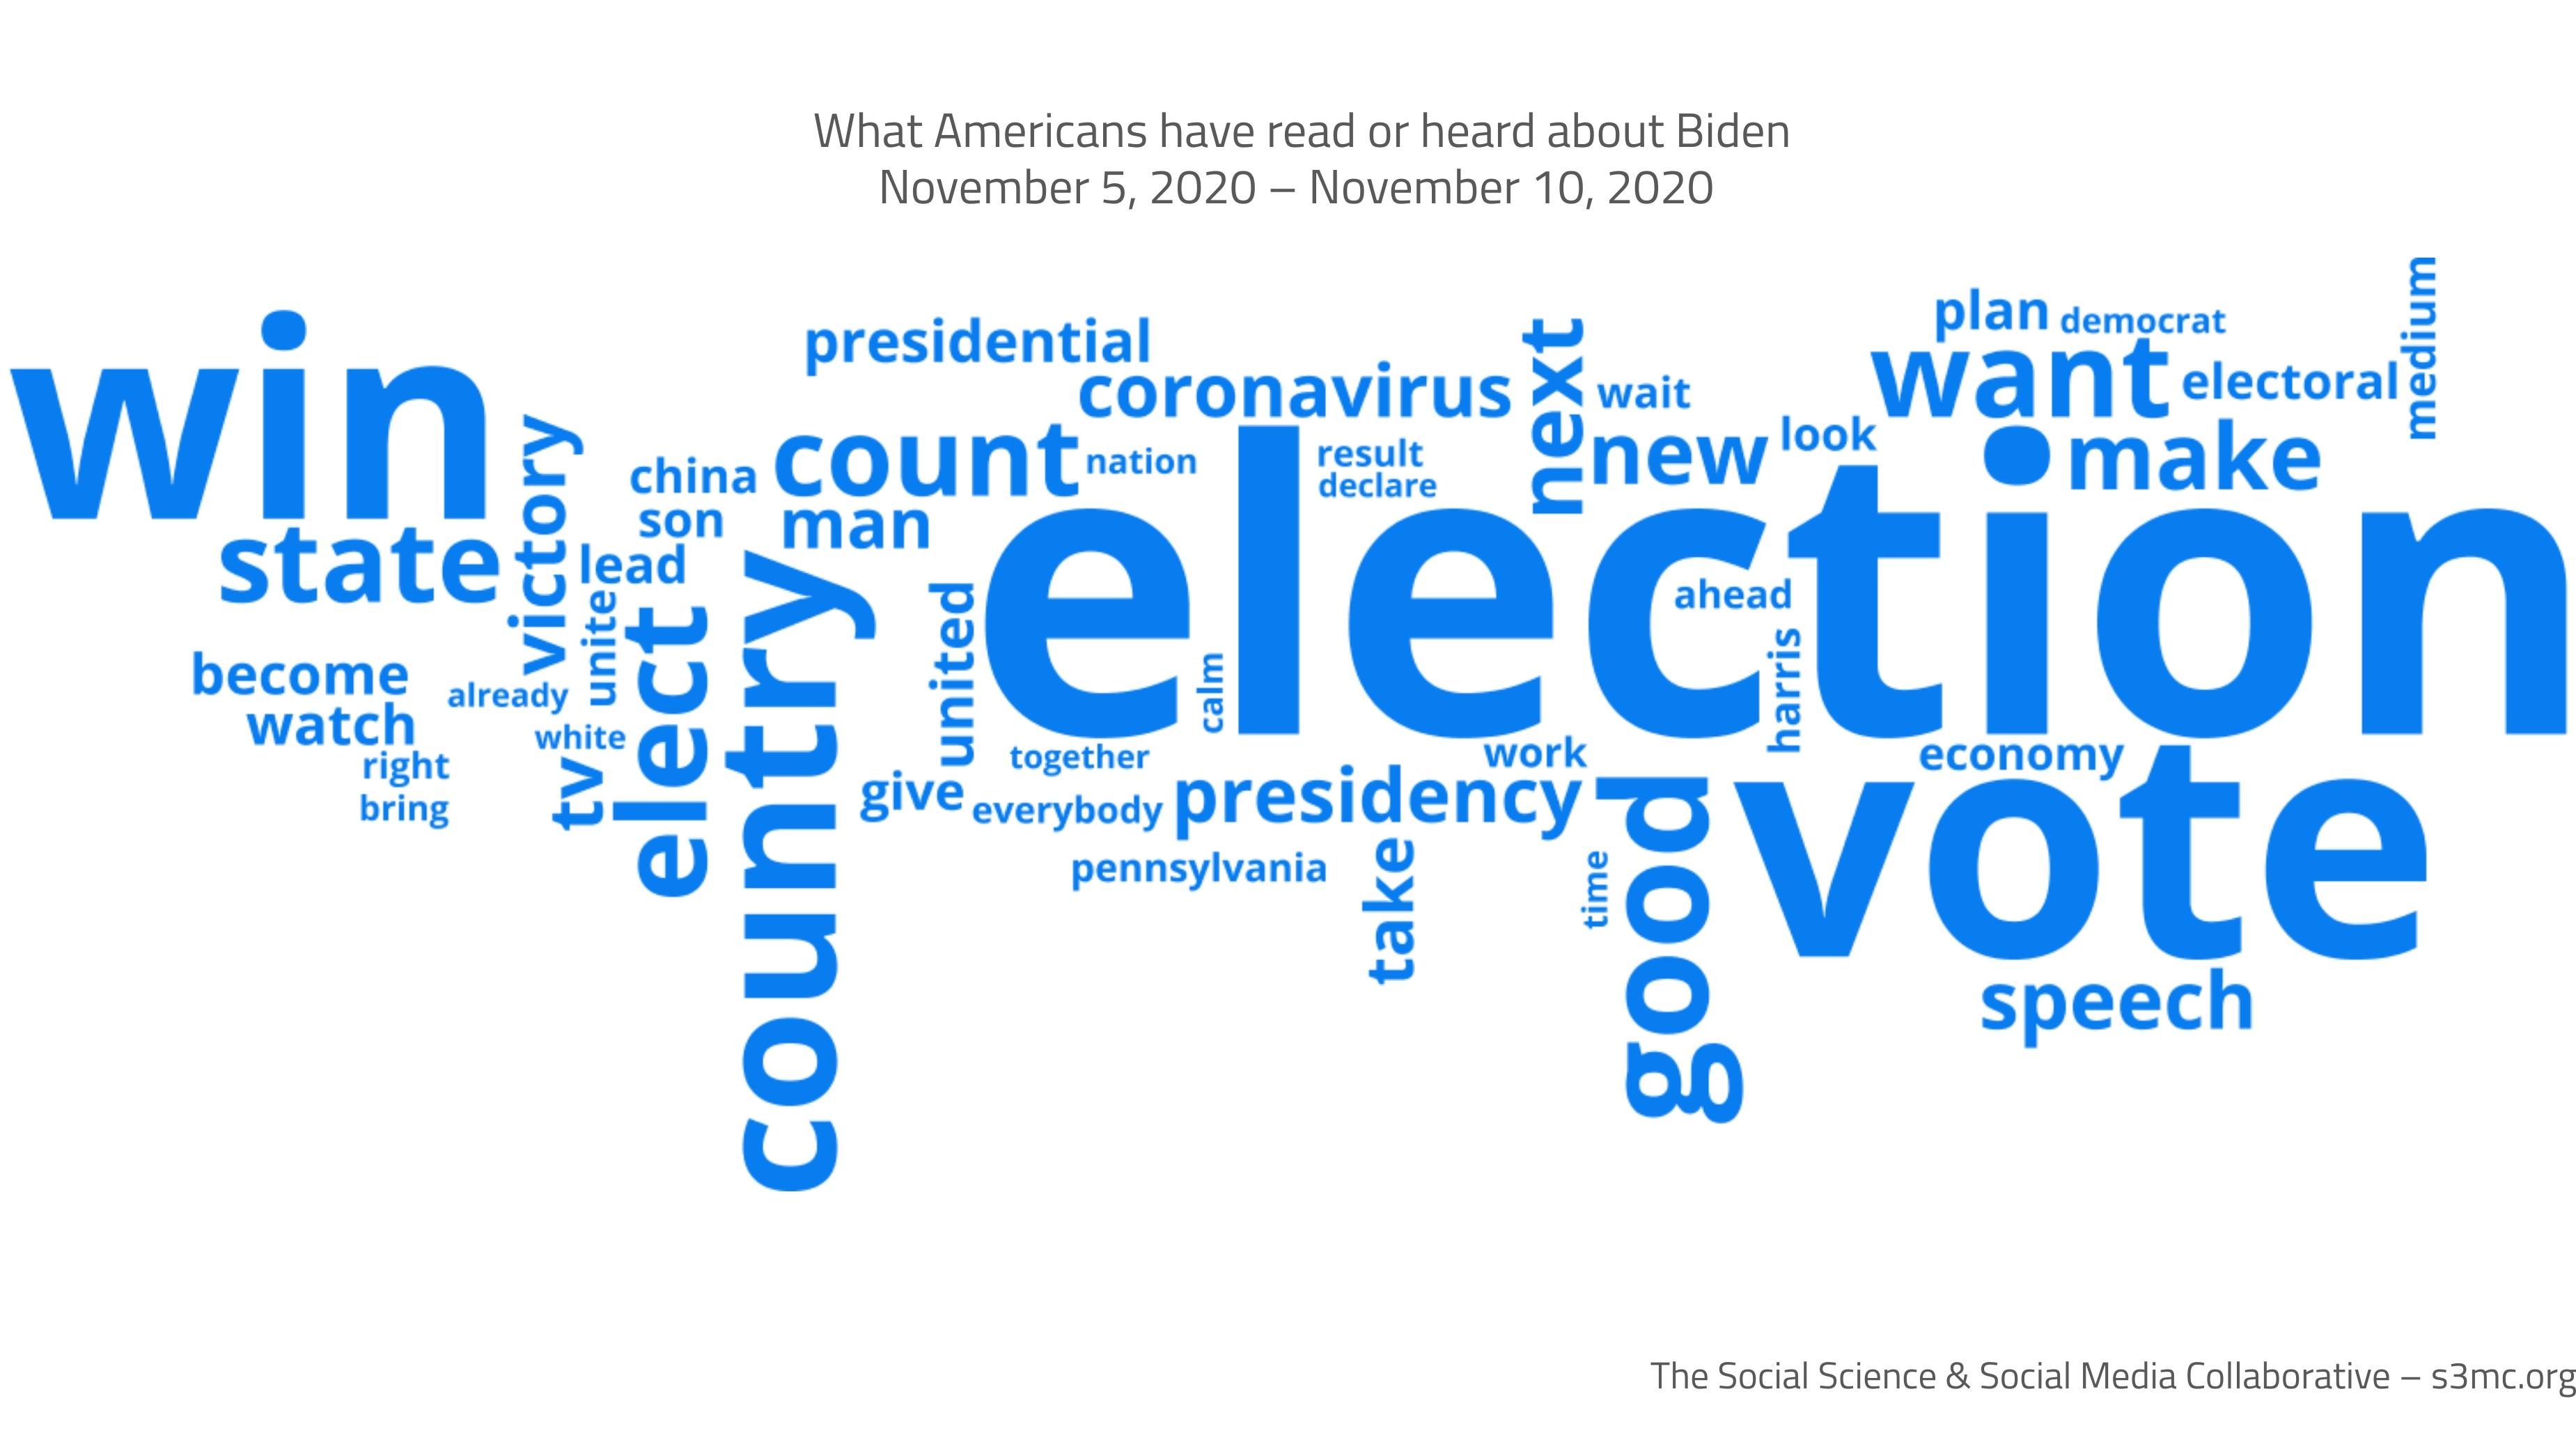 More recalled Biden as winning the election